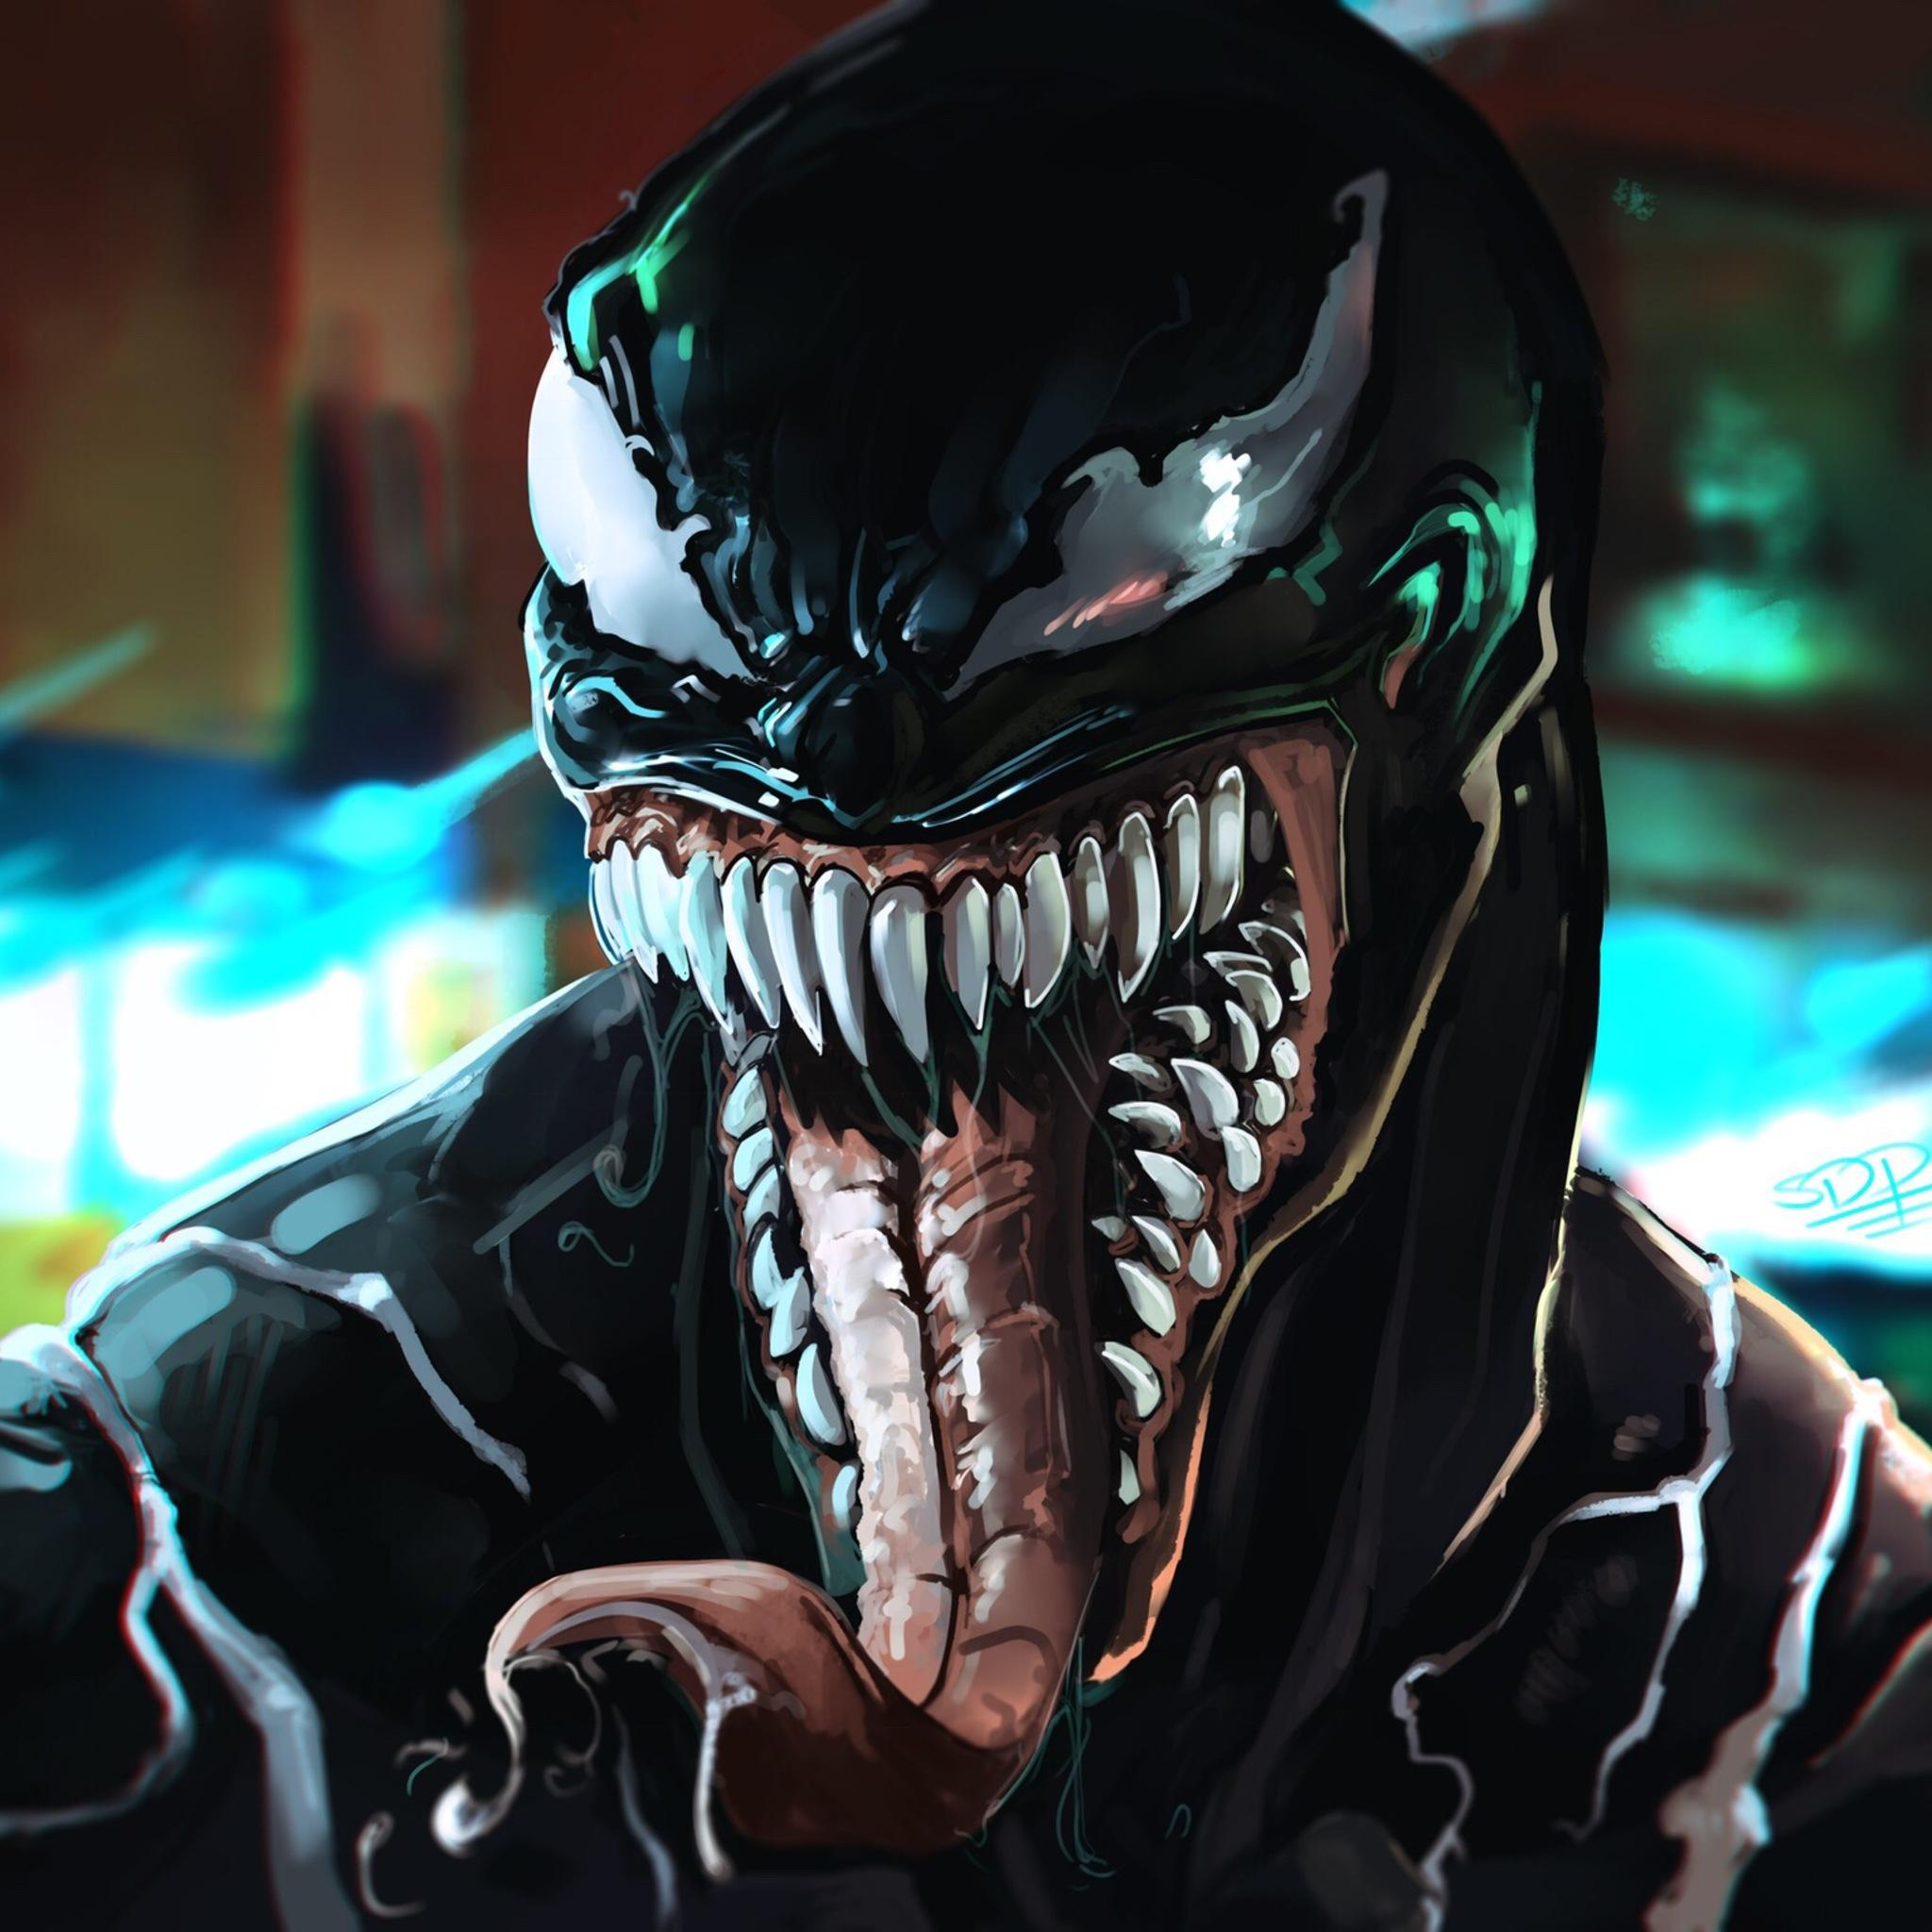 Venom Wallpapers: 2048x2048 Venom Movie Art Ipad Air HD 4k Wallpapers